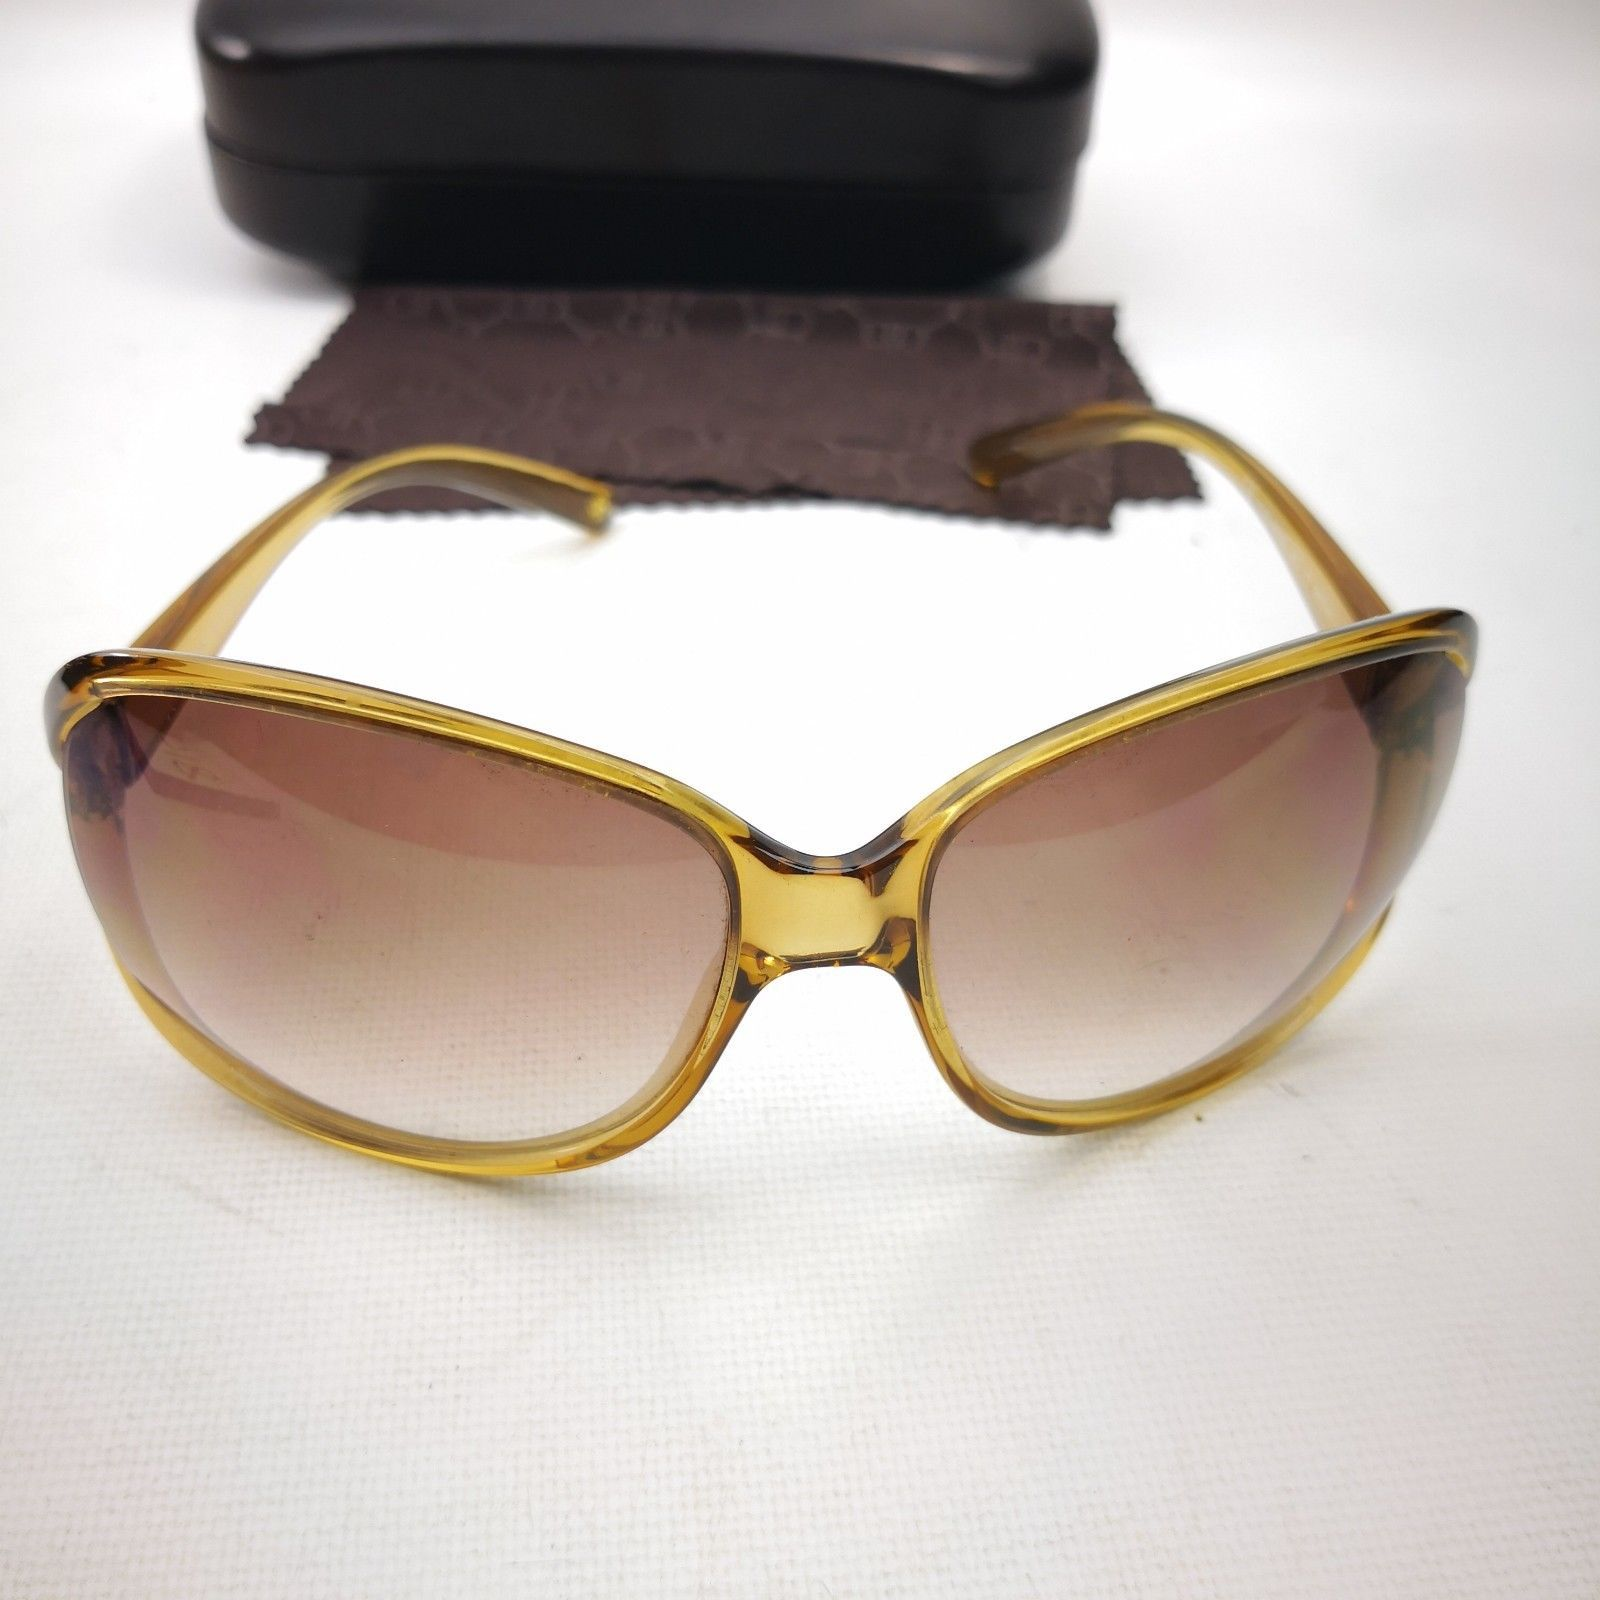 4fb08931a598e Banana Republic BR Sunglasses Heather DK3 YY and similar items. 57